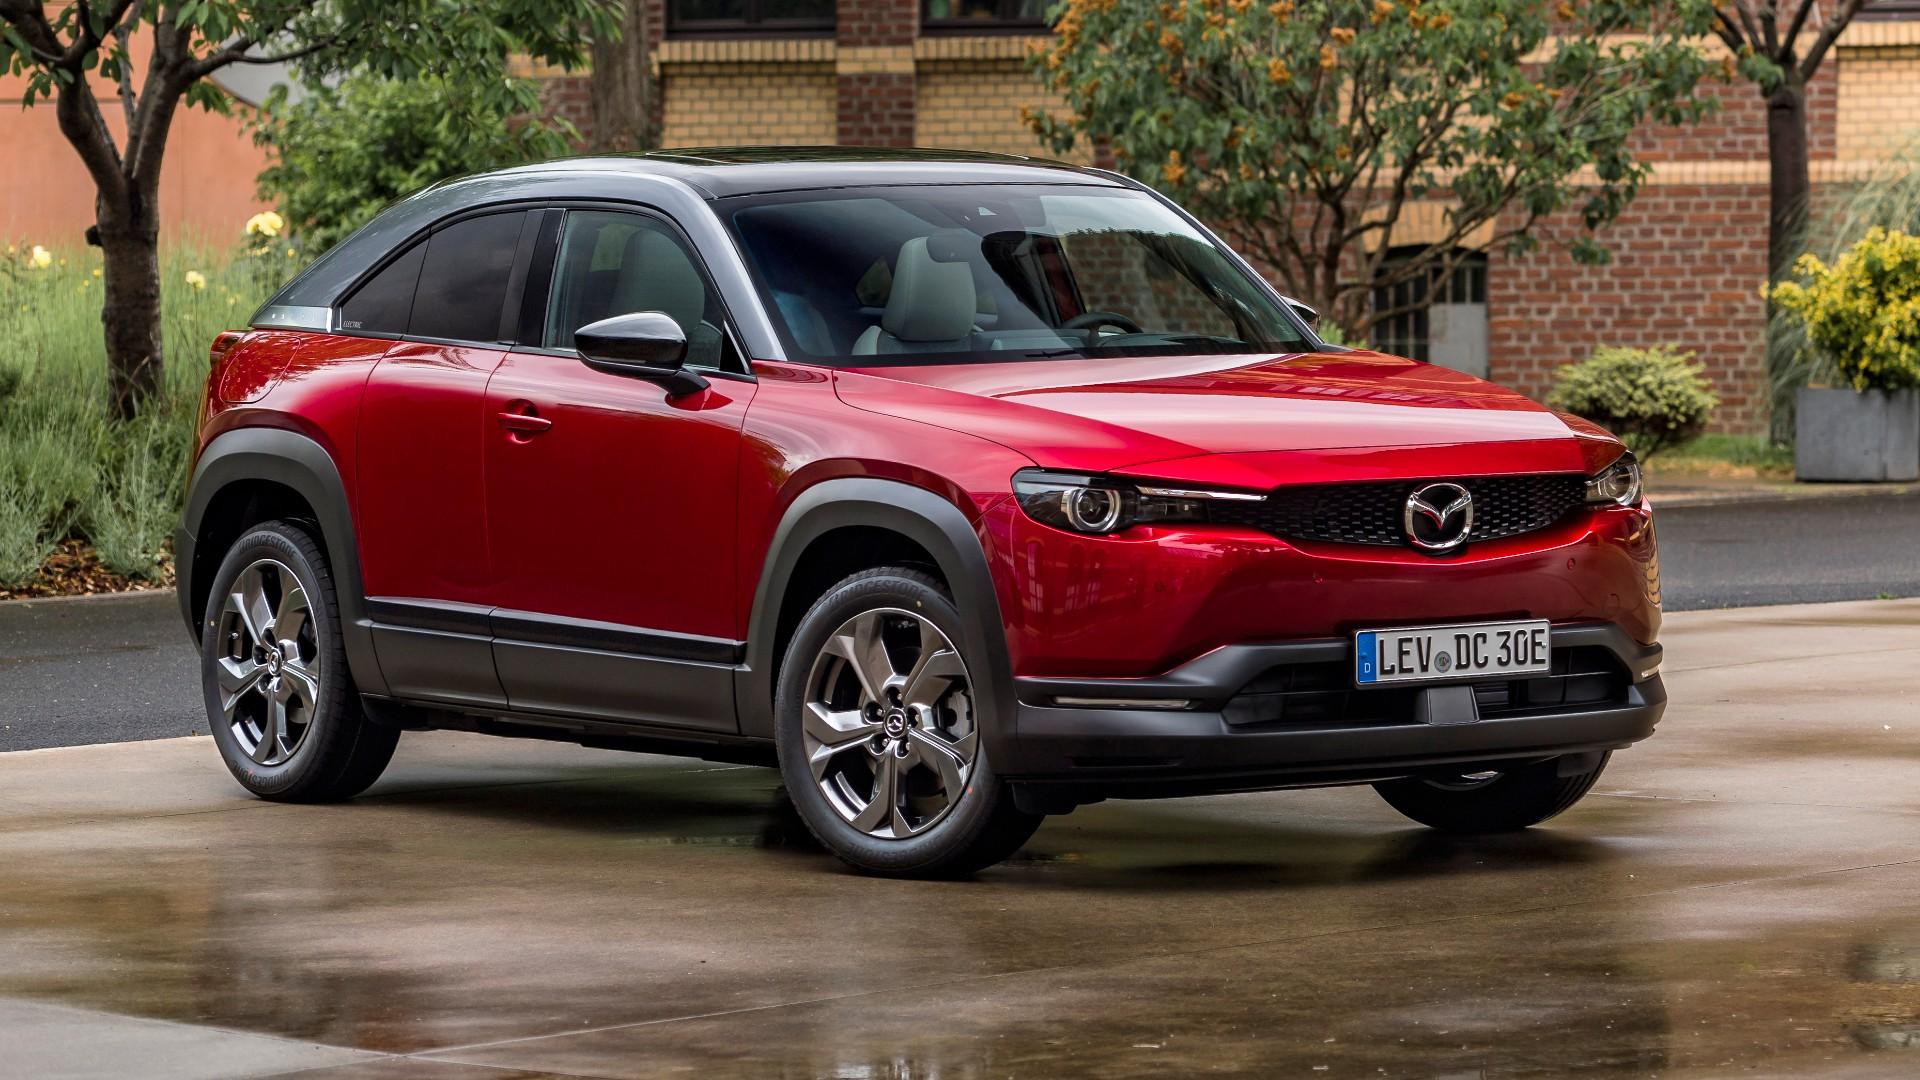 Mazda: Ανακαλεί τα ηλεκτρικά MX-30 που πουλήθηκαν στην Ευρώπη